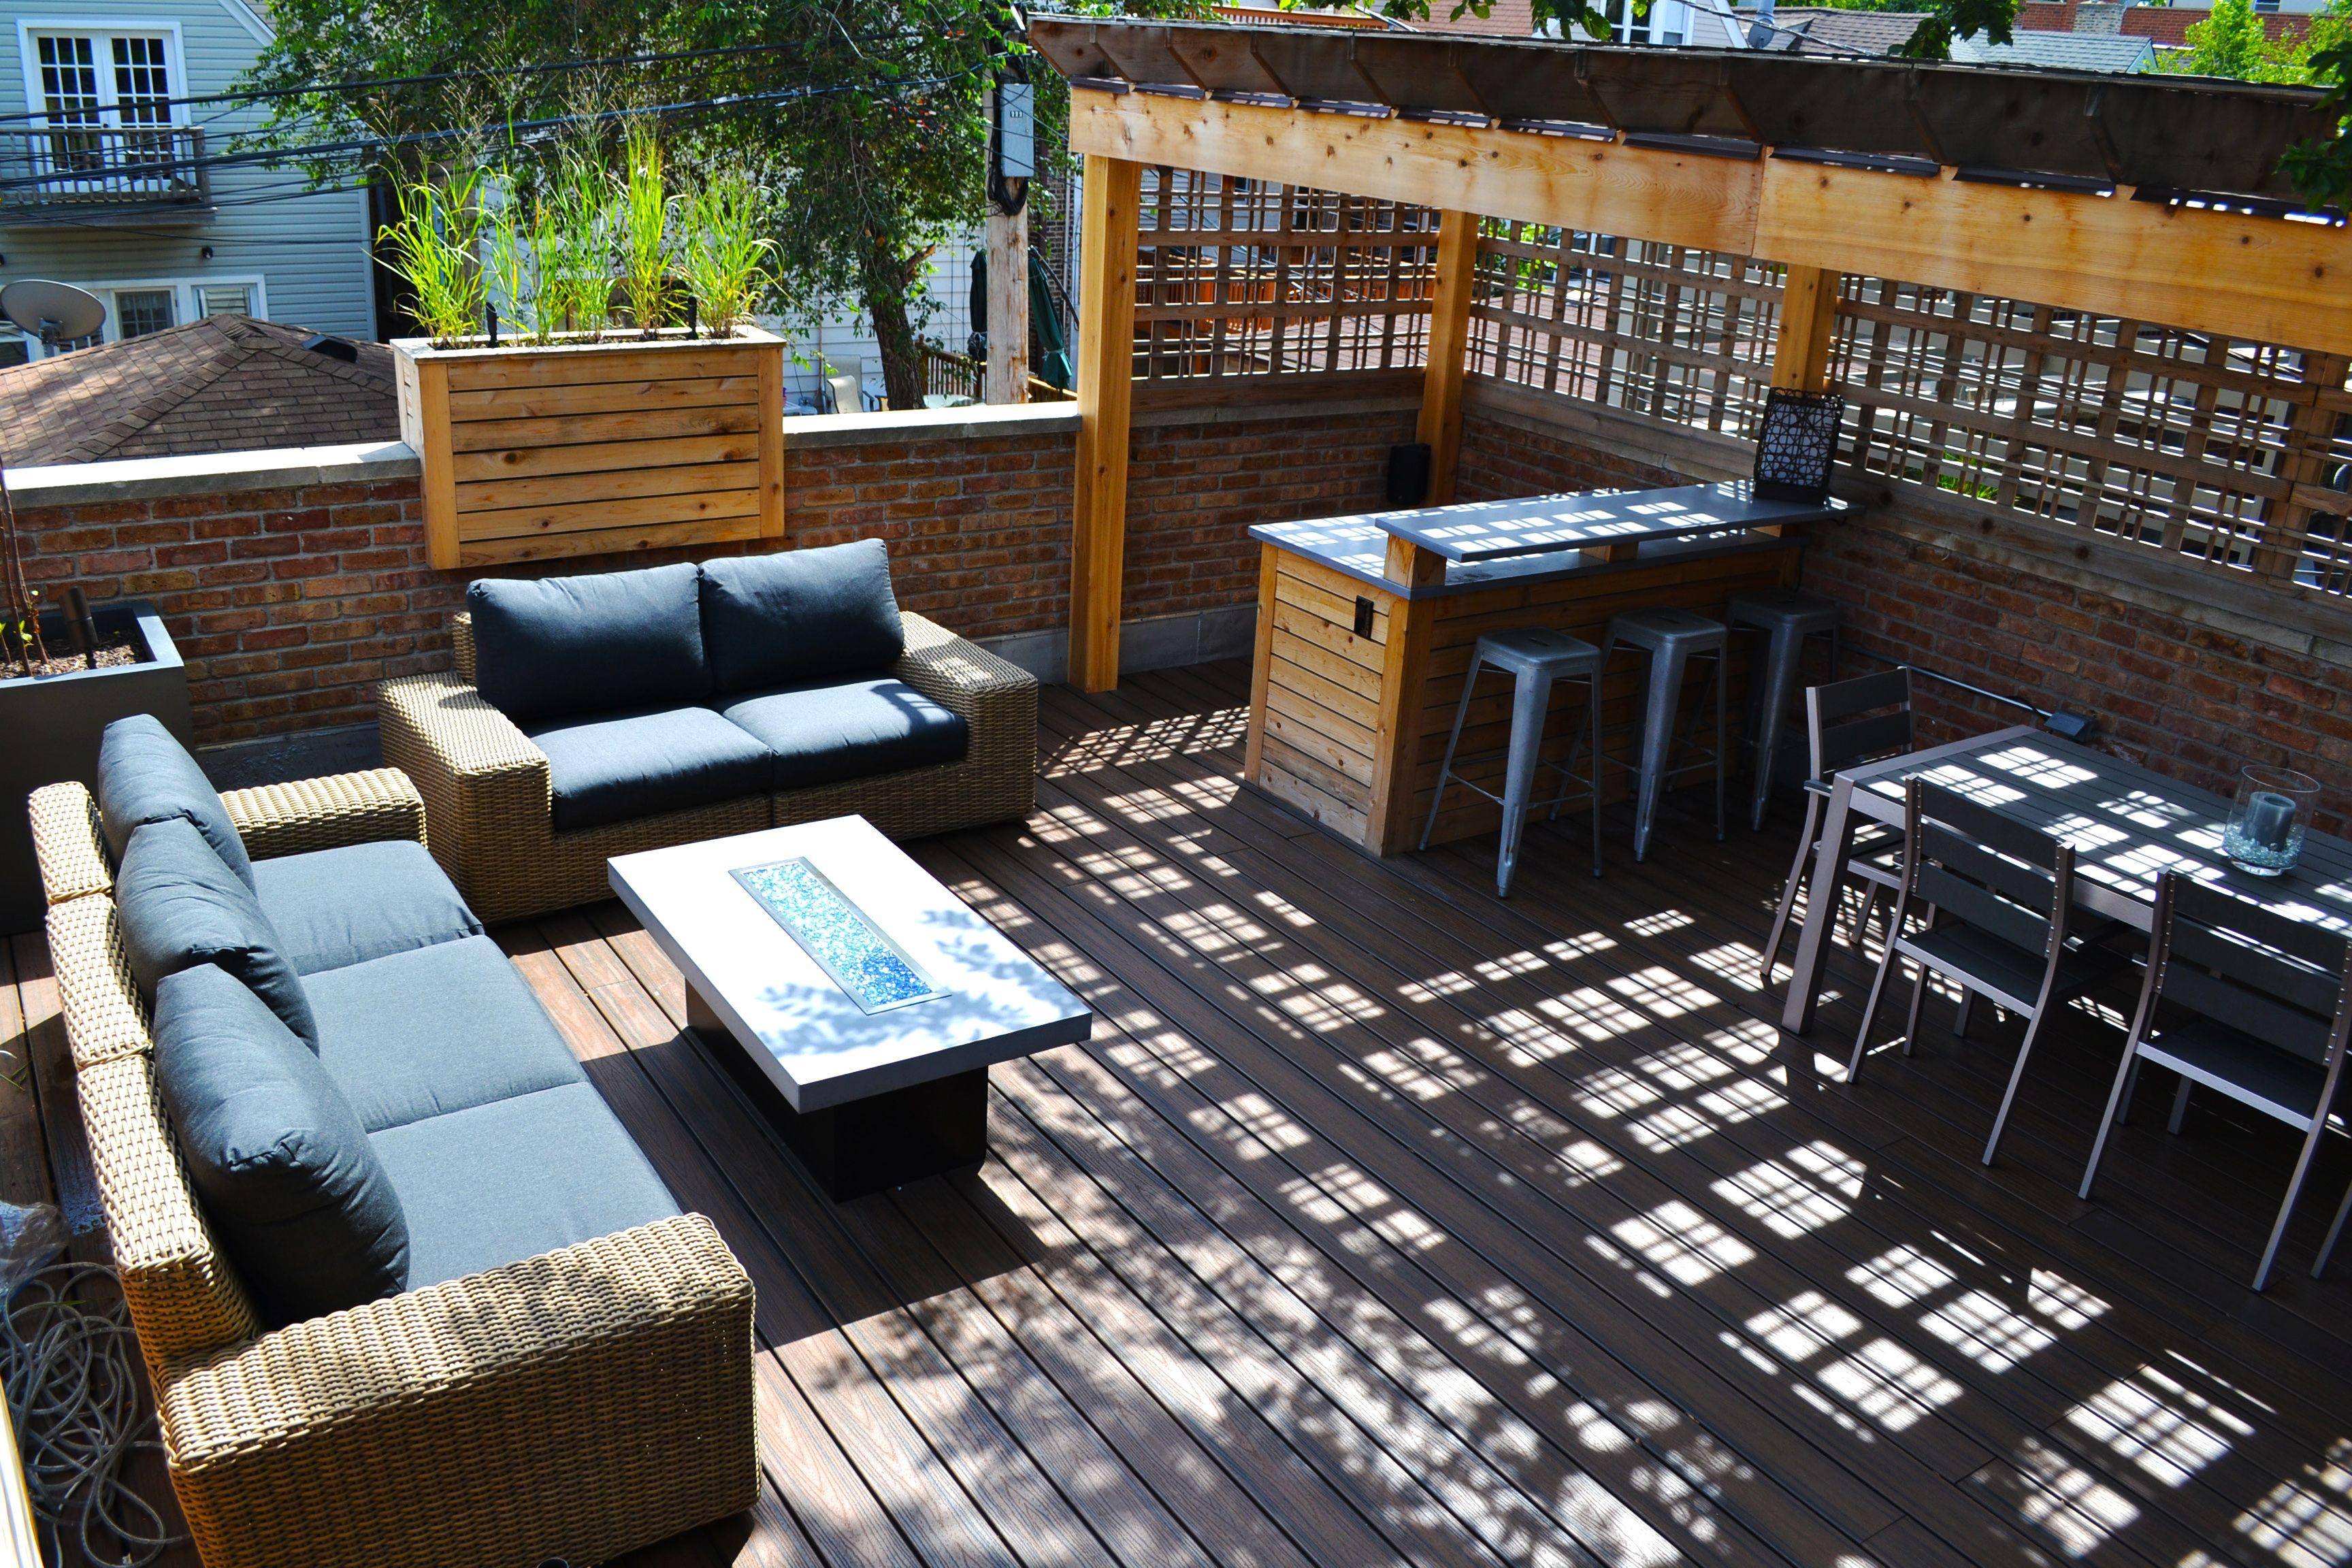 Chicago Roof Deck Built Garage Roof Deck With Cedar